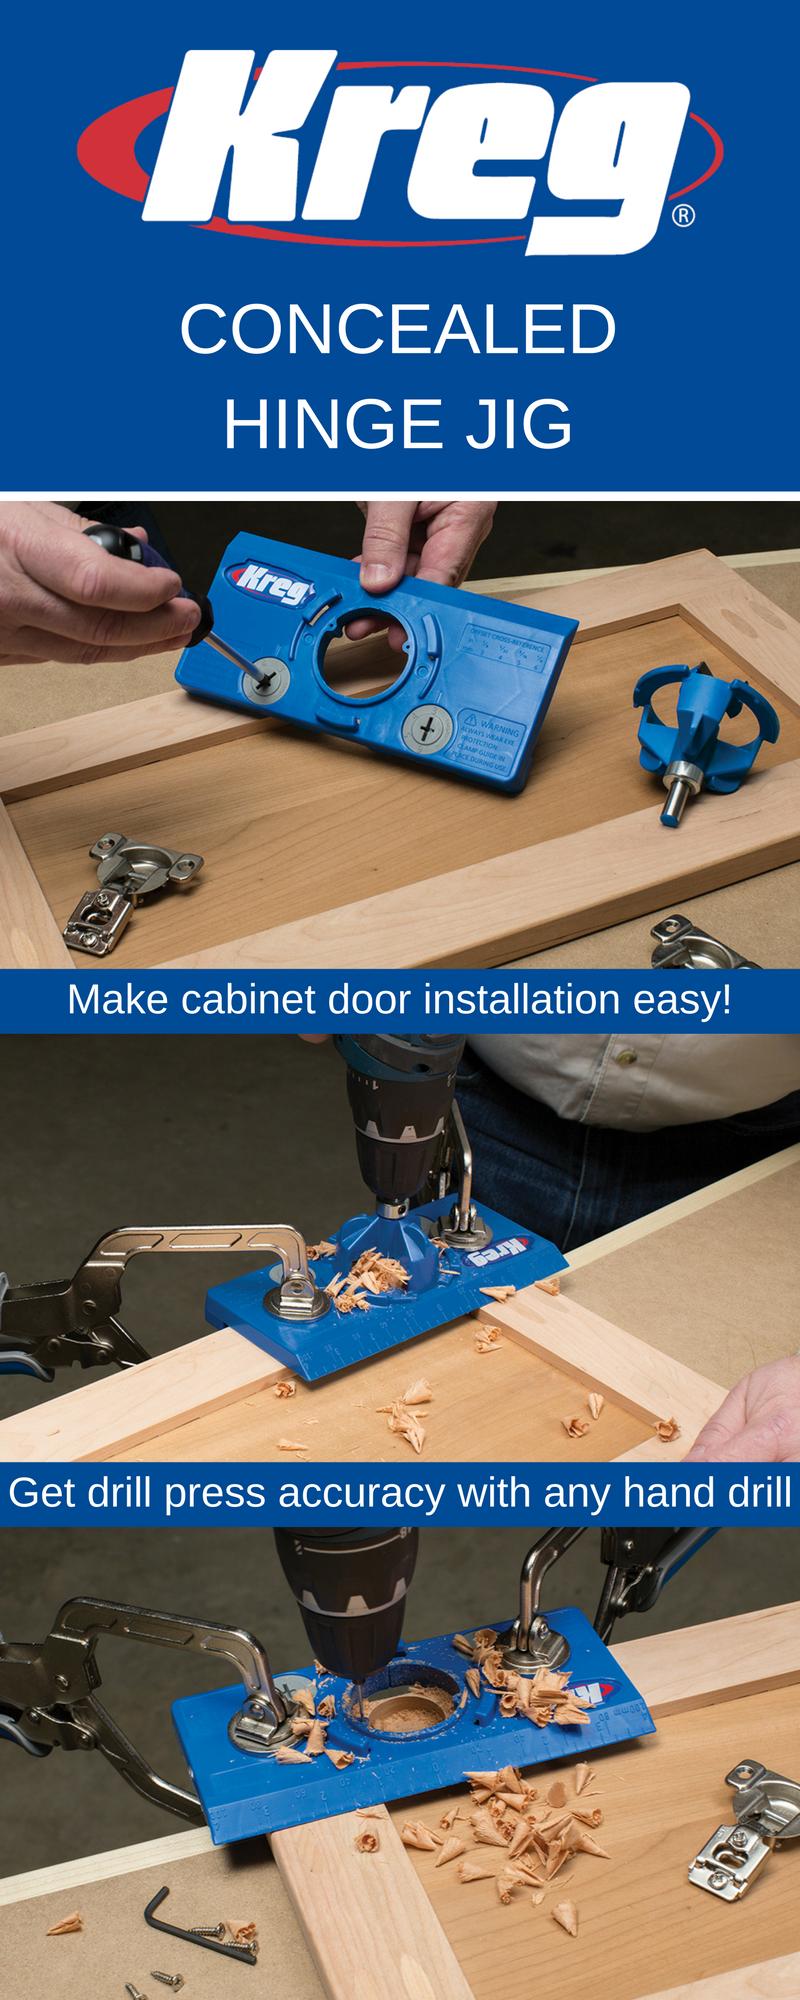 Concealed Hinge Jig Concealed Hinges Installing Cabinets Woodworking